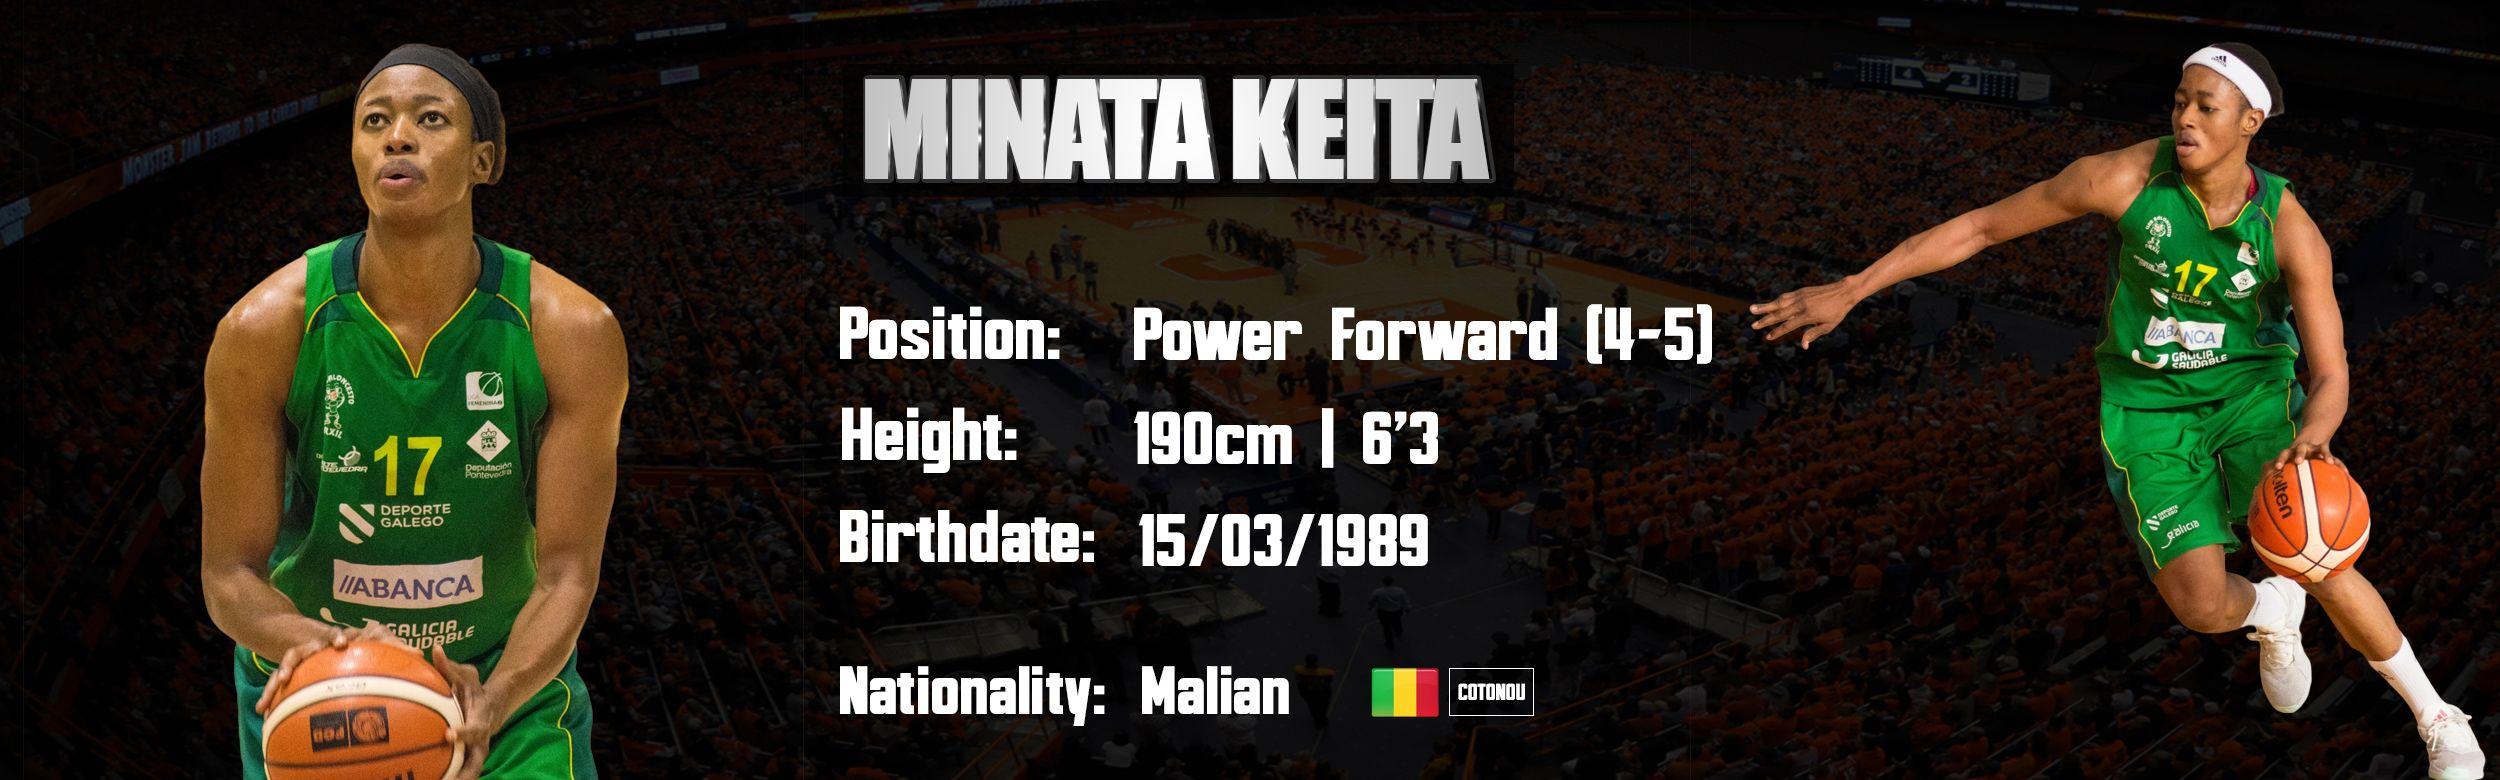 Minata Keita